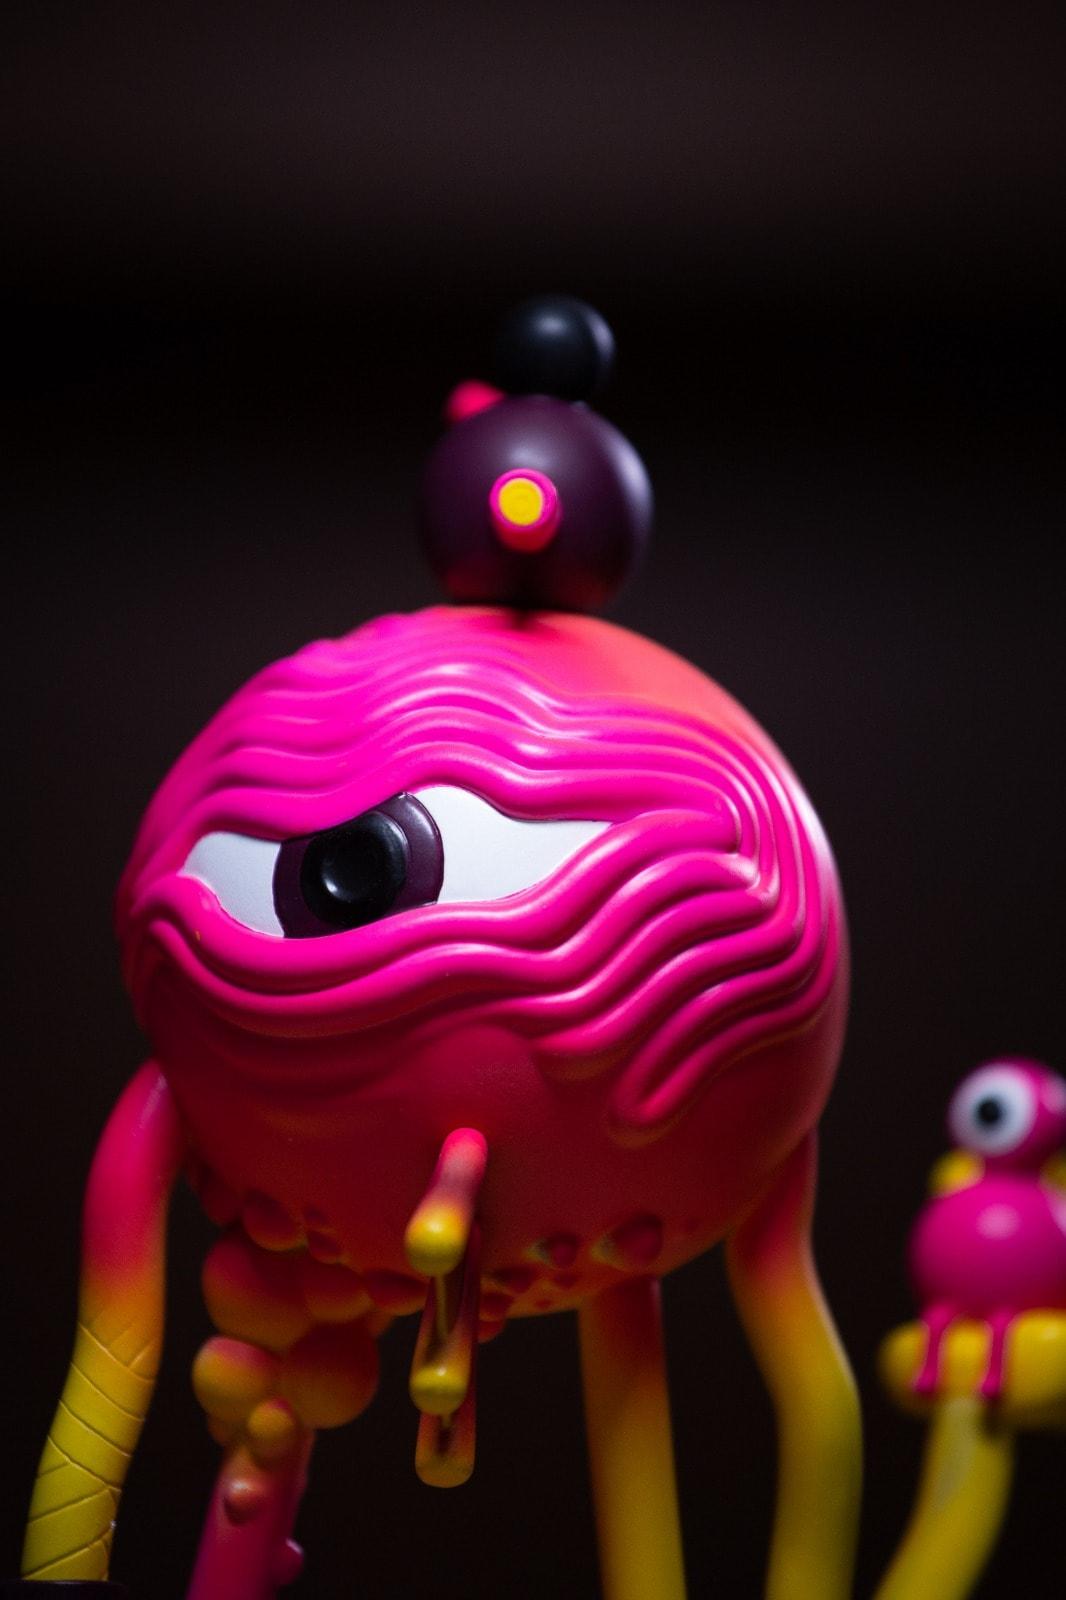 Pluteus Zeptiror 6 Forest Art Toy Resin Toy